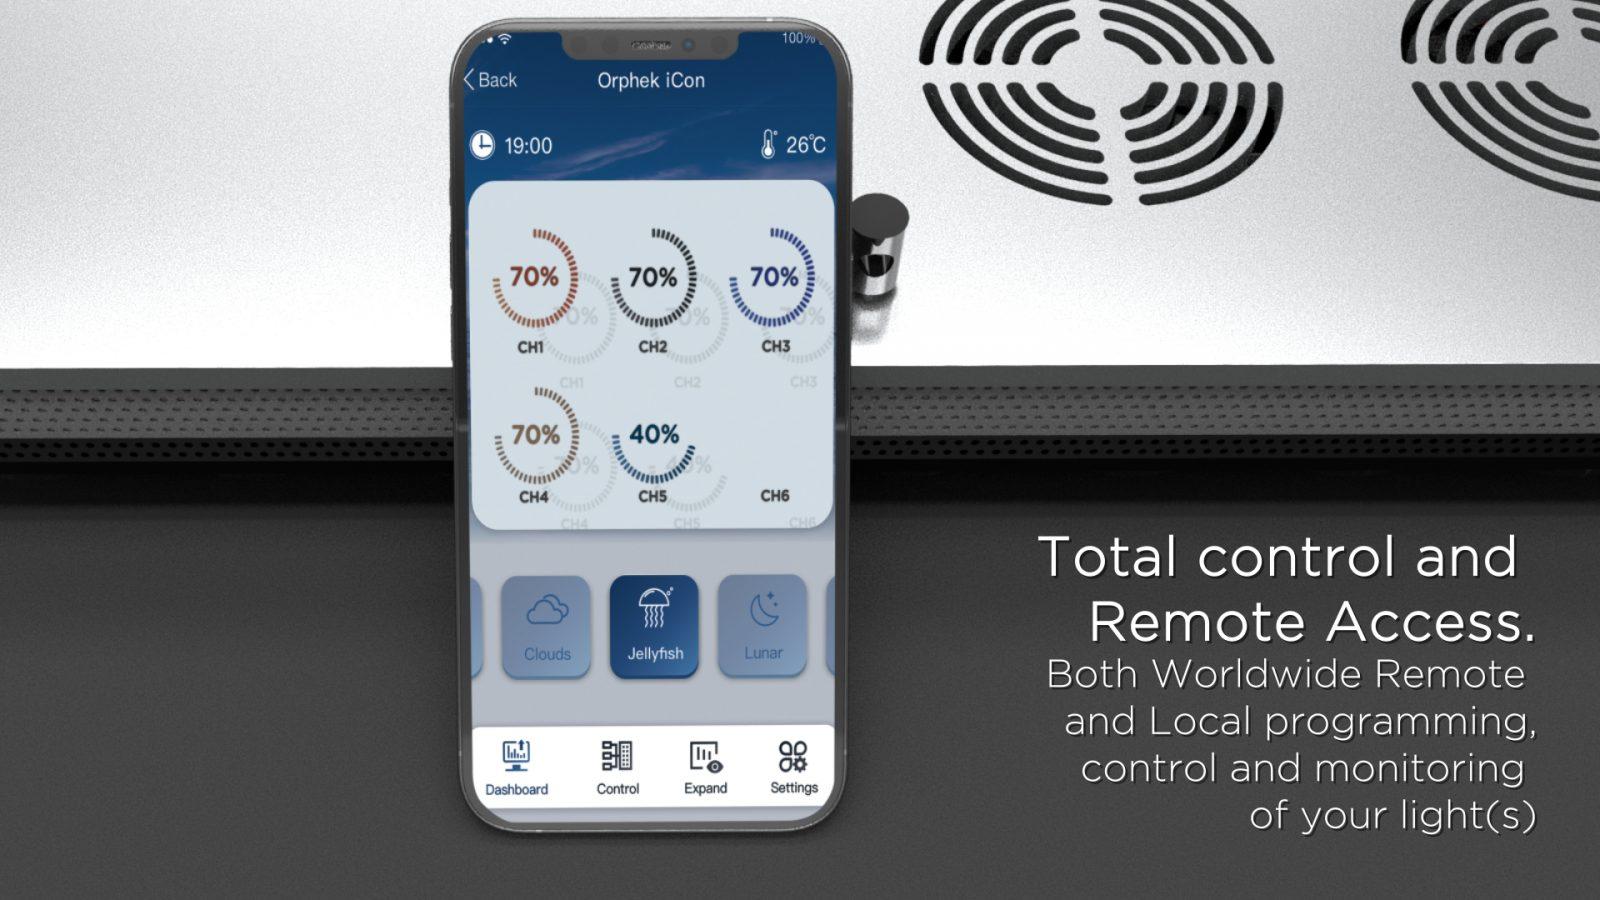 Orphek-iCon-App-per-IOS-e-Android